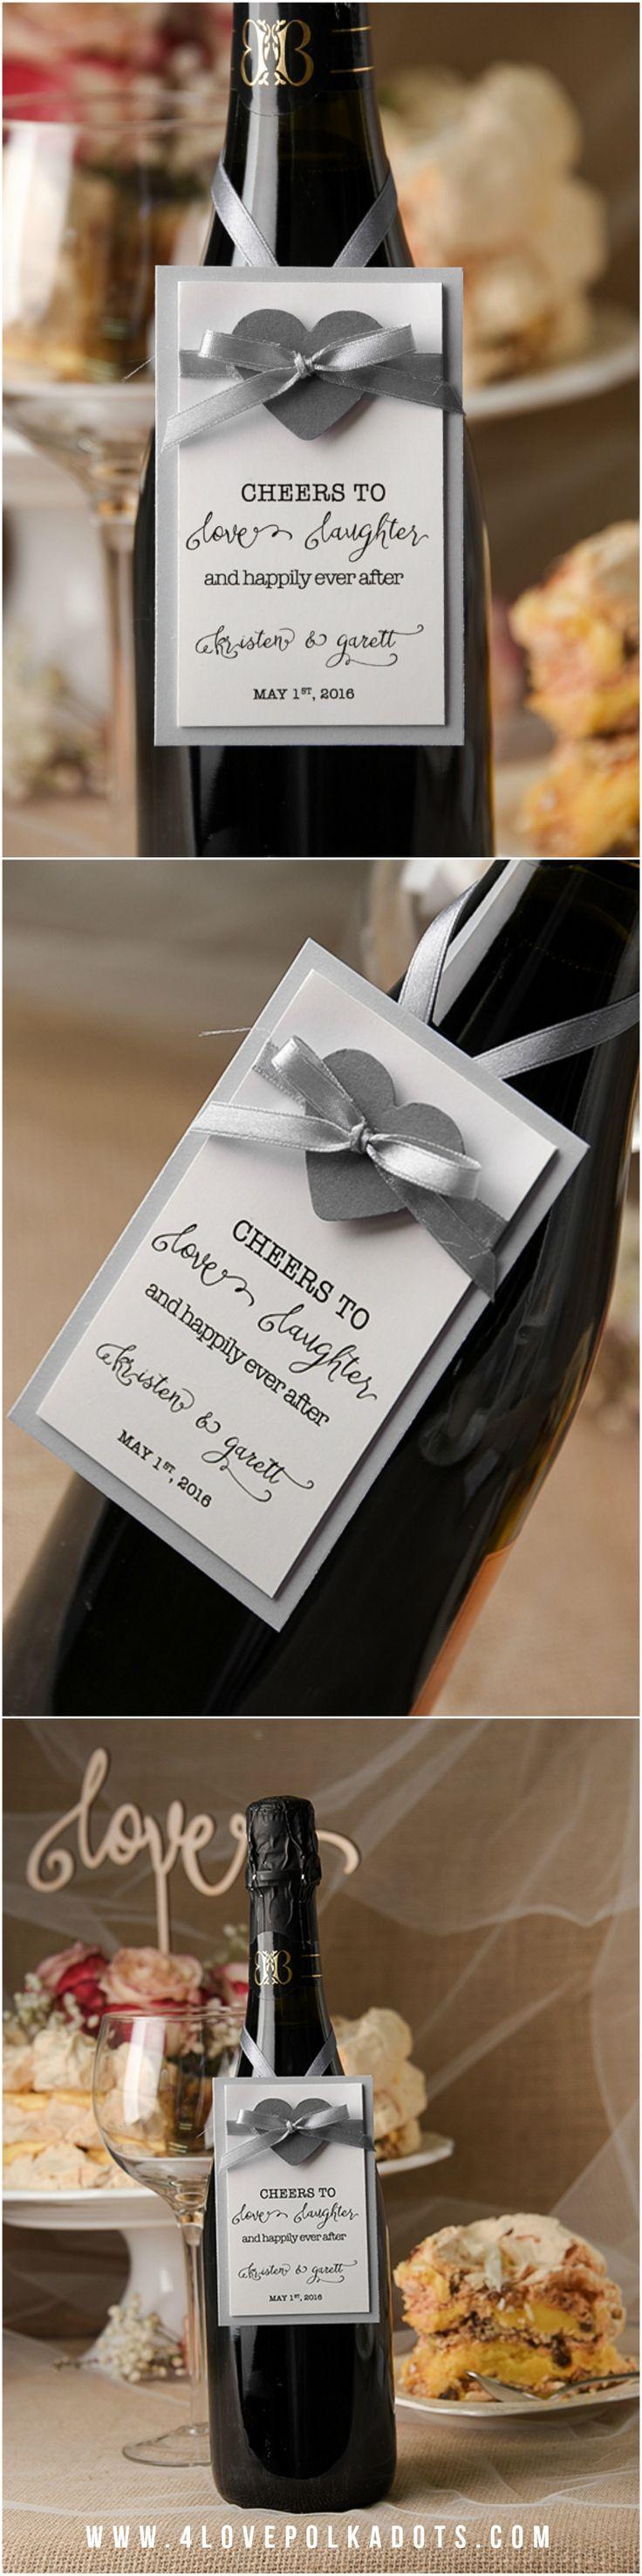 Silver, Grey & White Wedding Wine Labels #simple #elegant #romantic #weddingideas #weddingcards #calligraphy